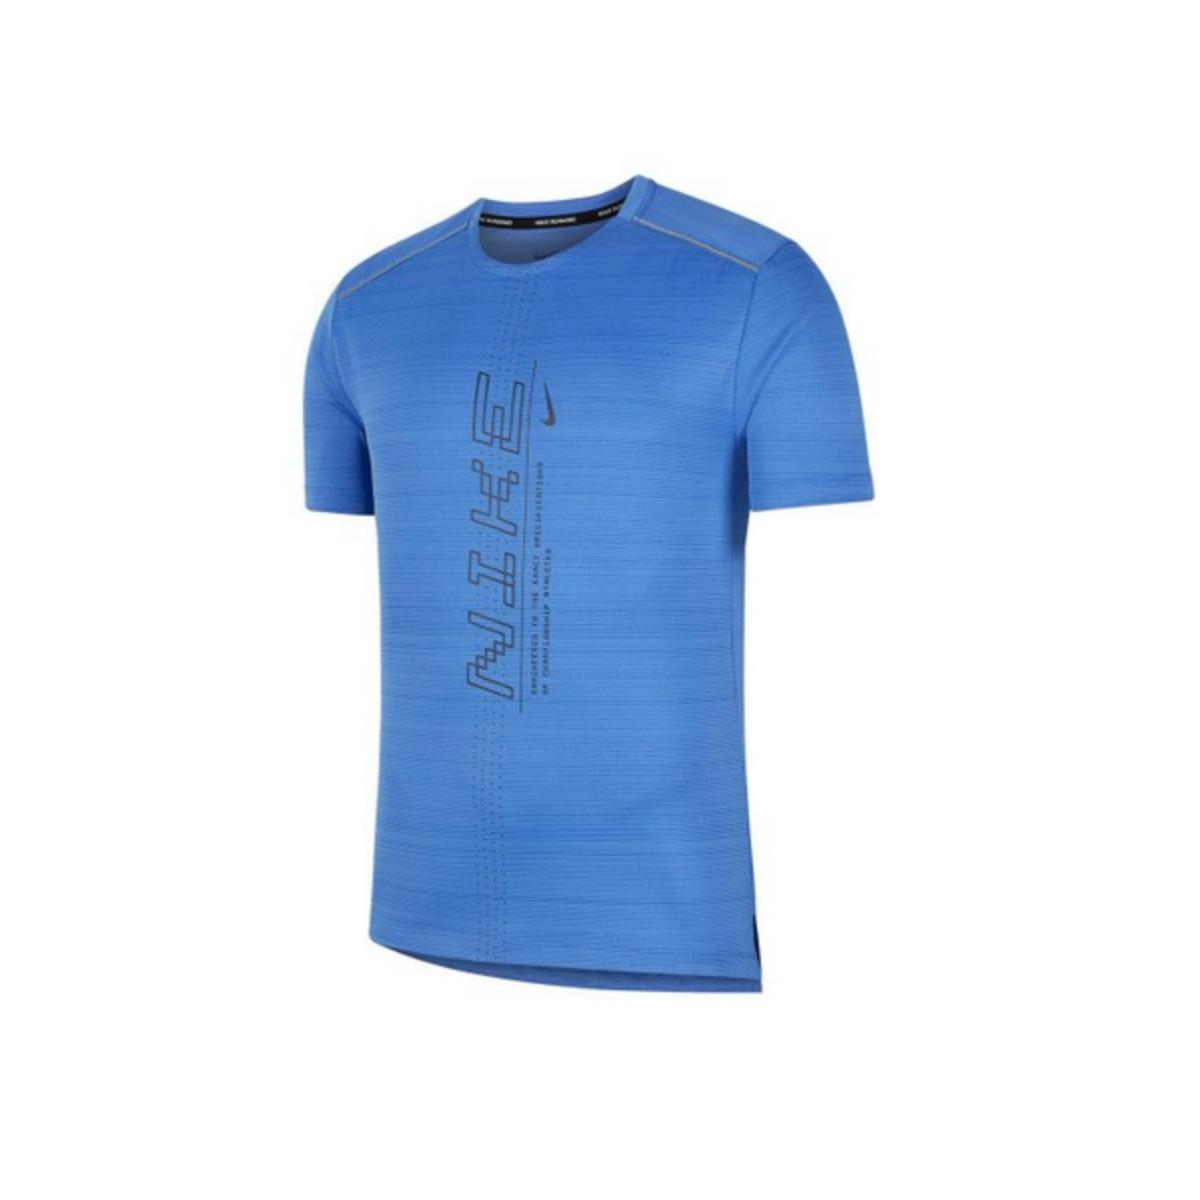 Camiseta Masculina Nike Cj5340-402 Dri Fit Miler Azul